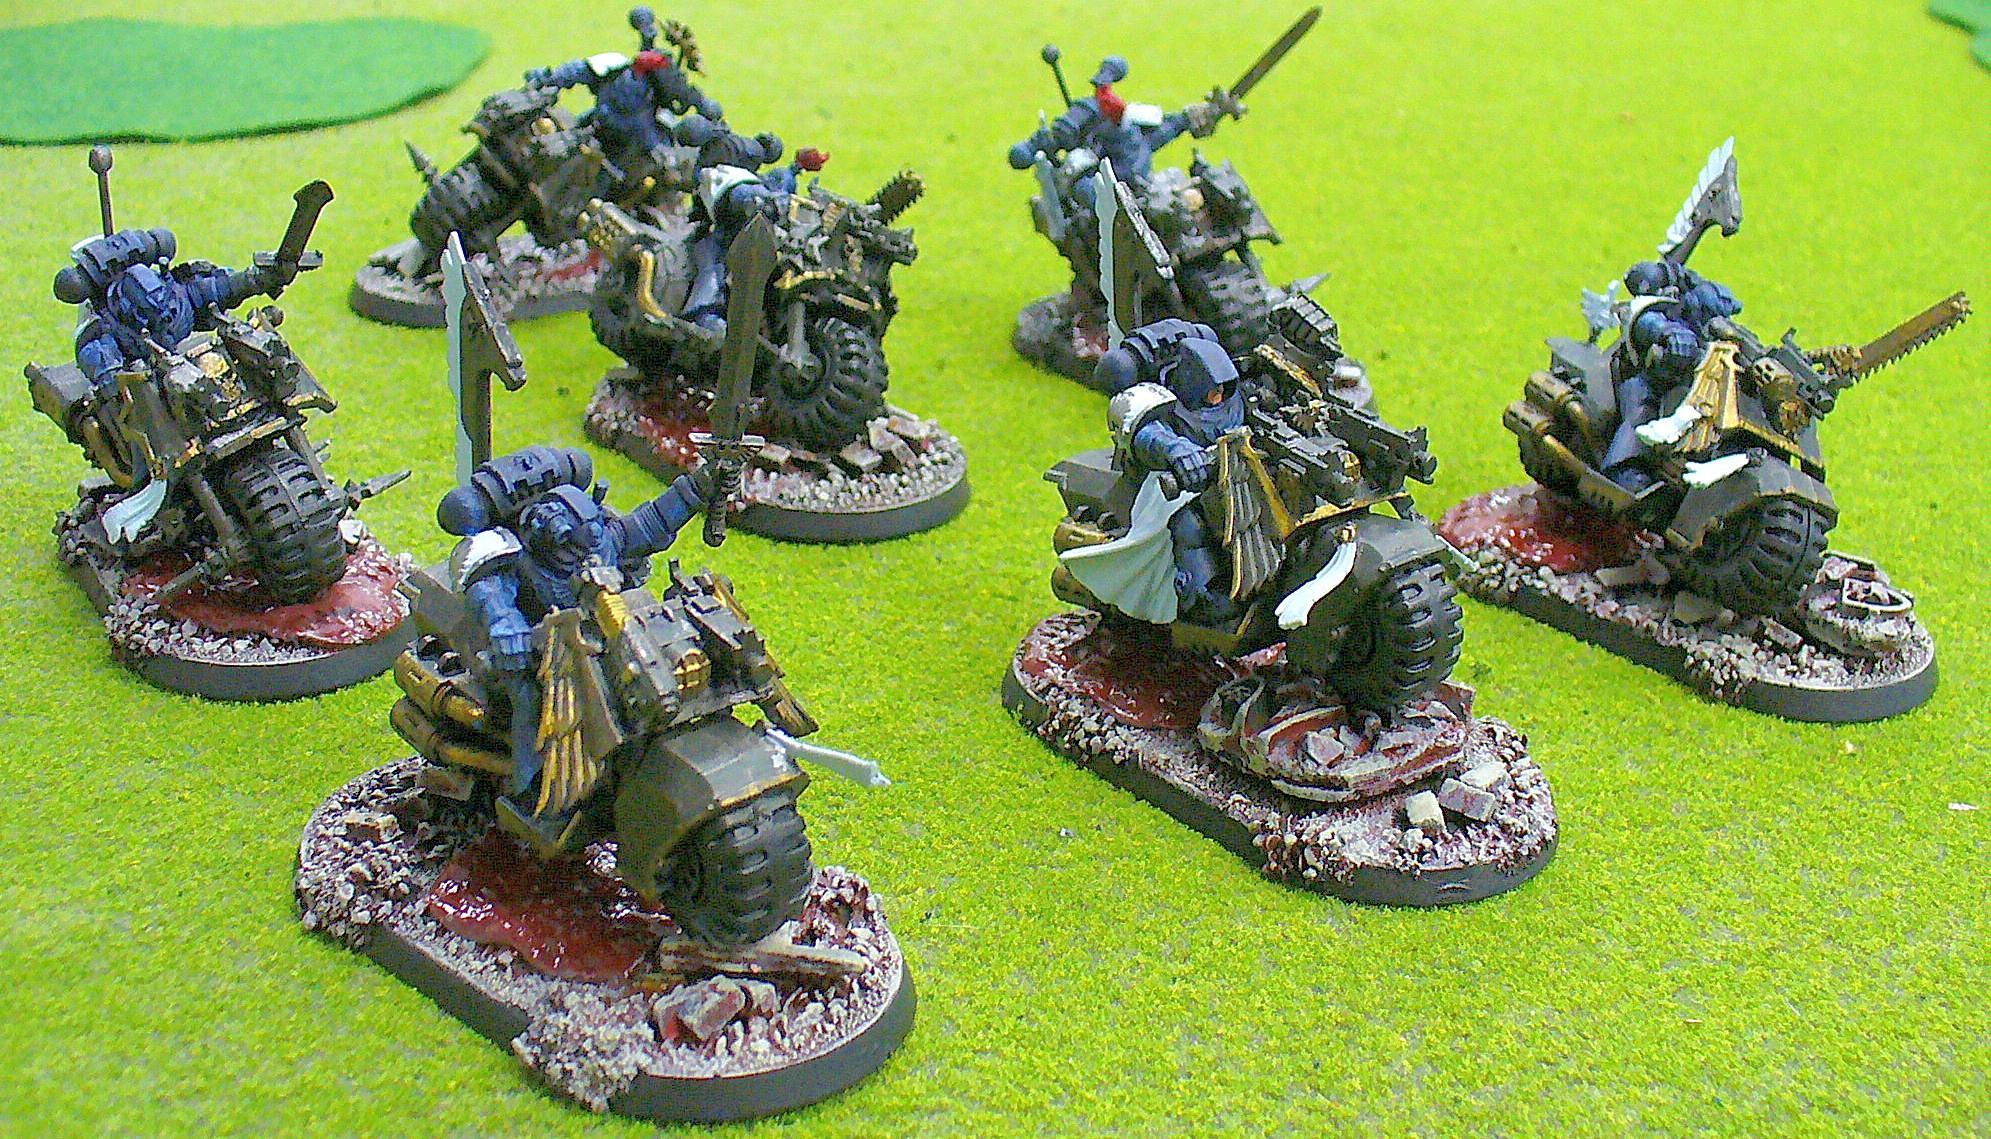 Alpha Legion, Base, Bike, Chaos, Chaos Space Marines, Conversion, Robed, Warhammer 40,000